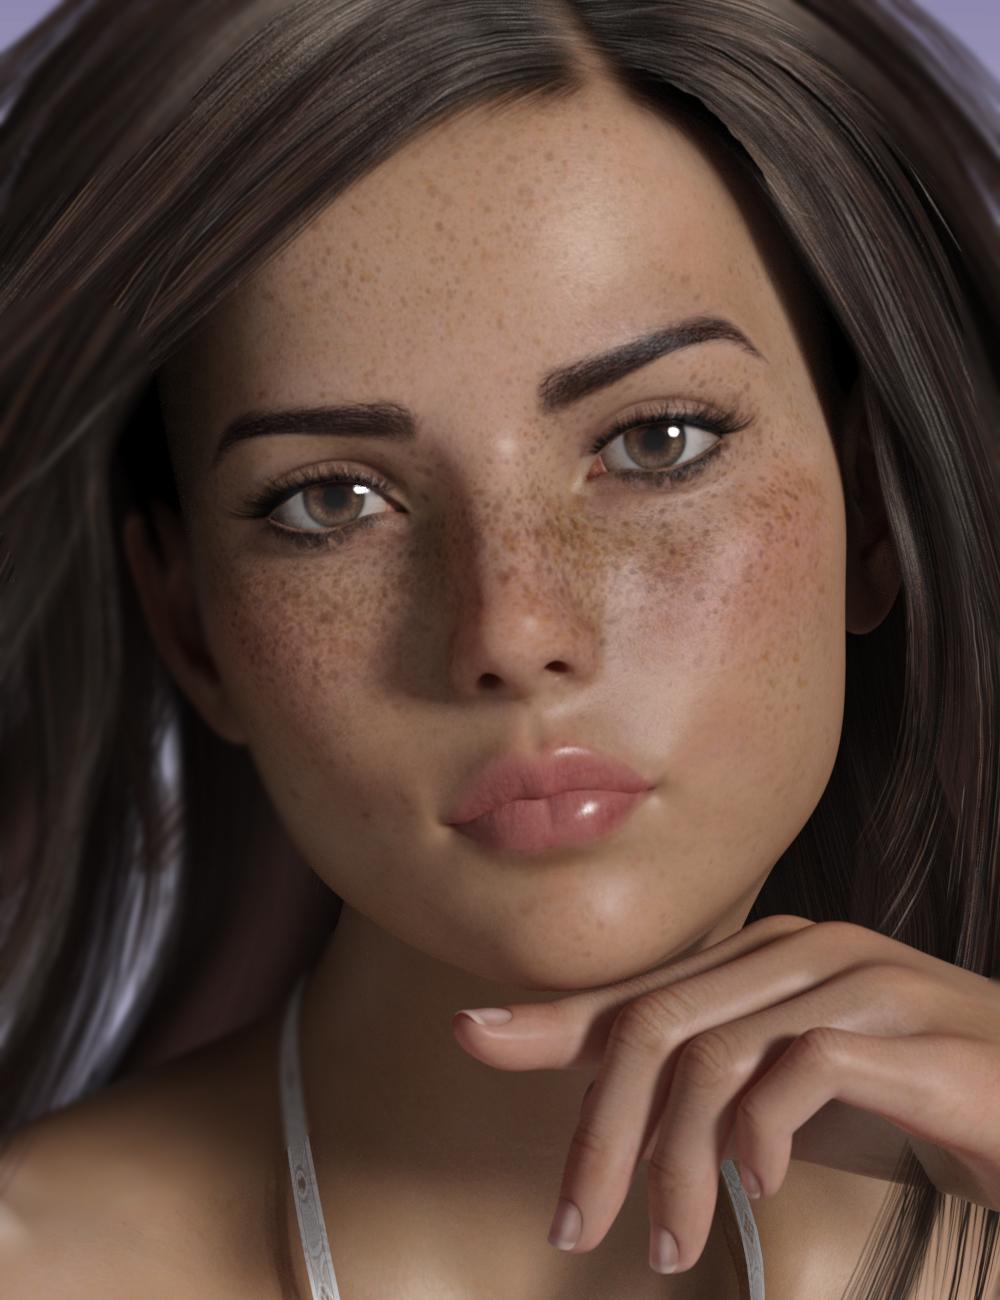 P3D Harper for Genesis 8 Female by: P3Design, 3D Models by Daz 3D